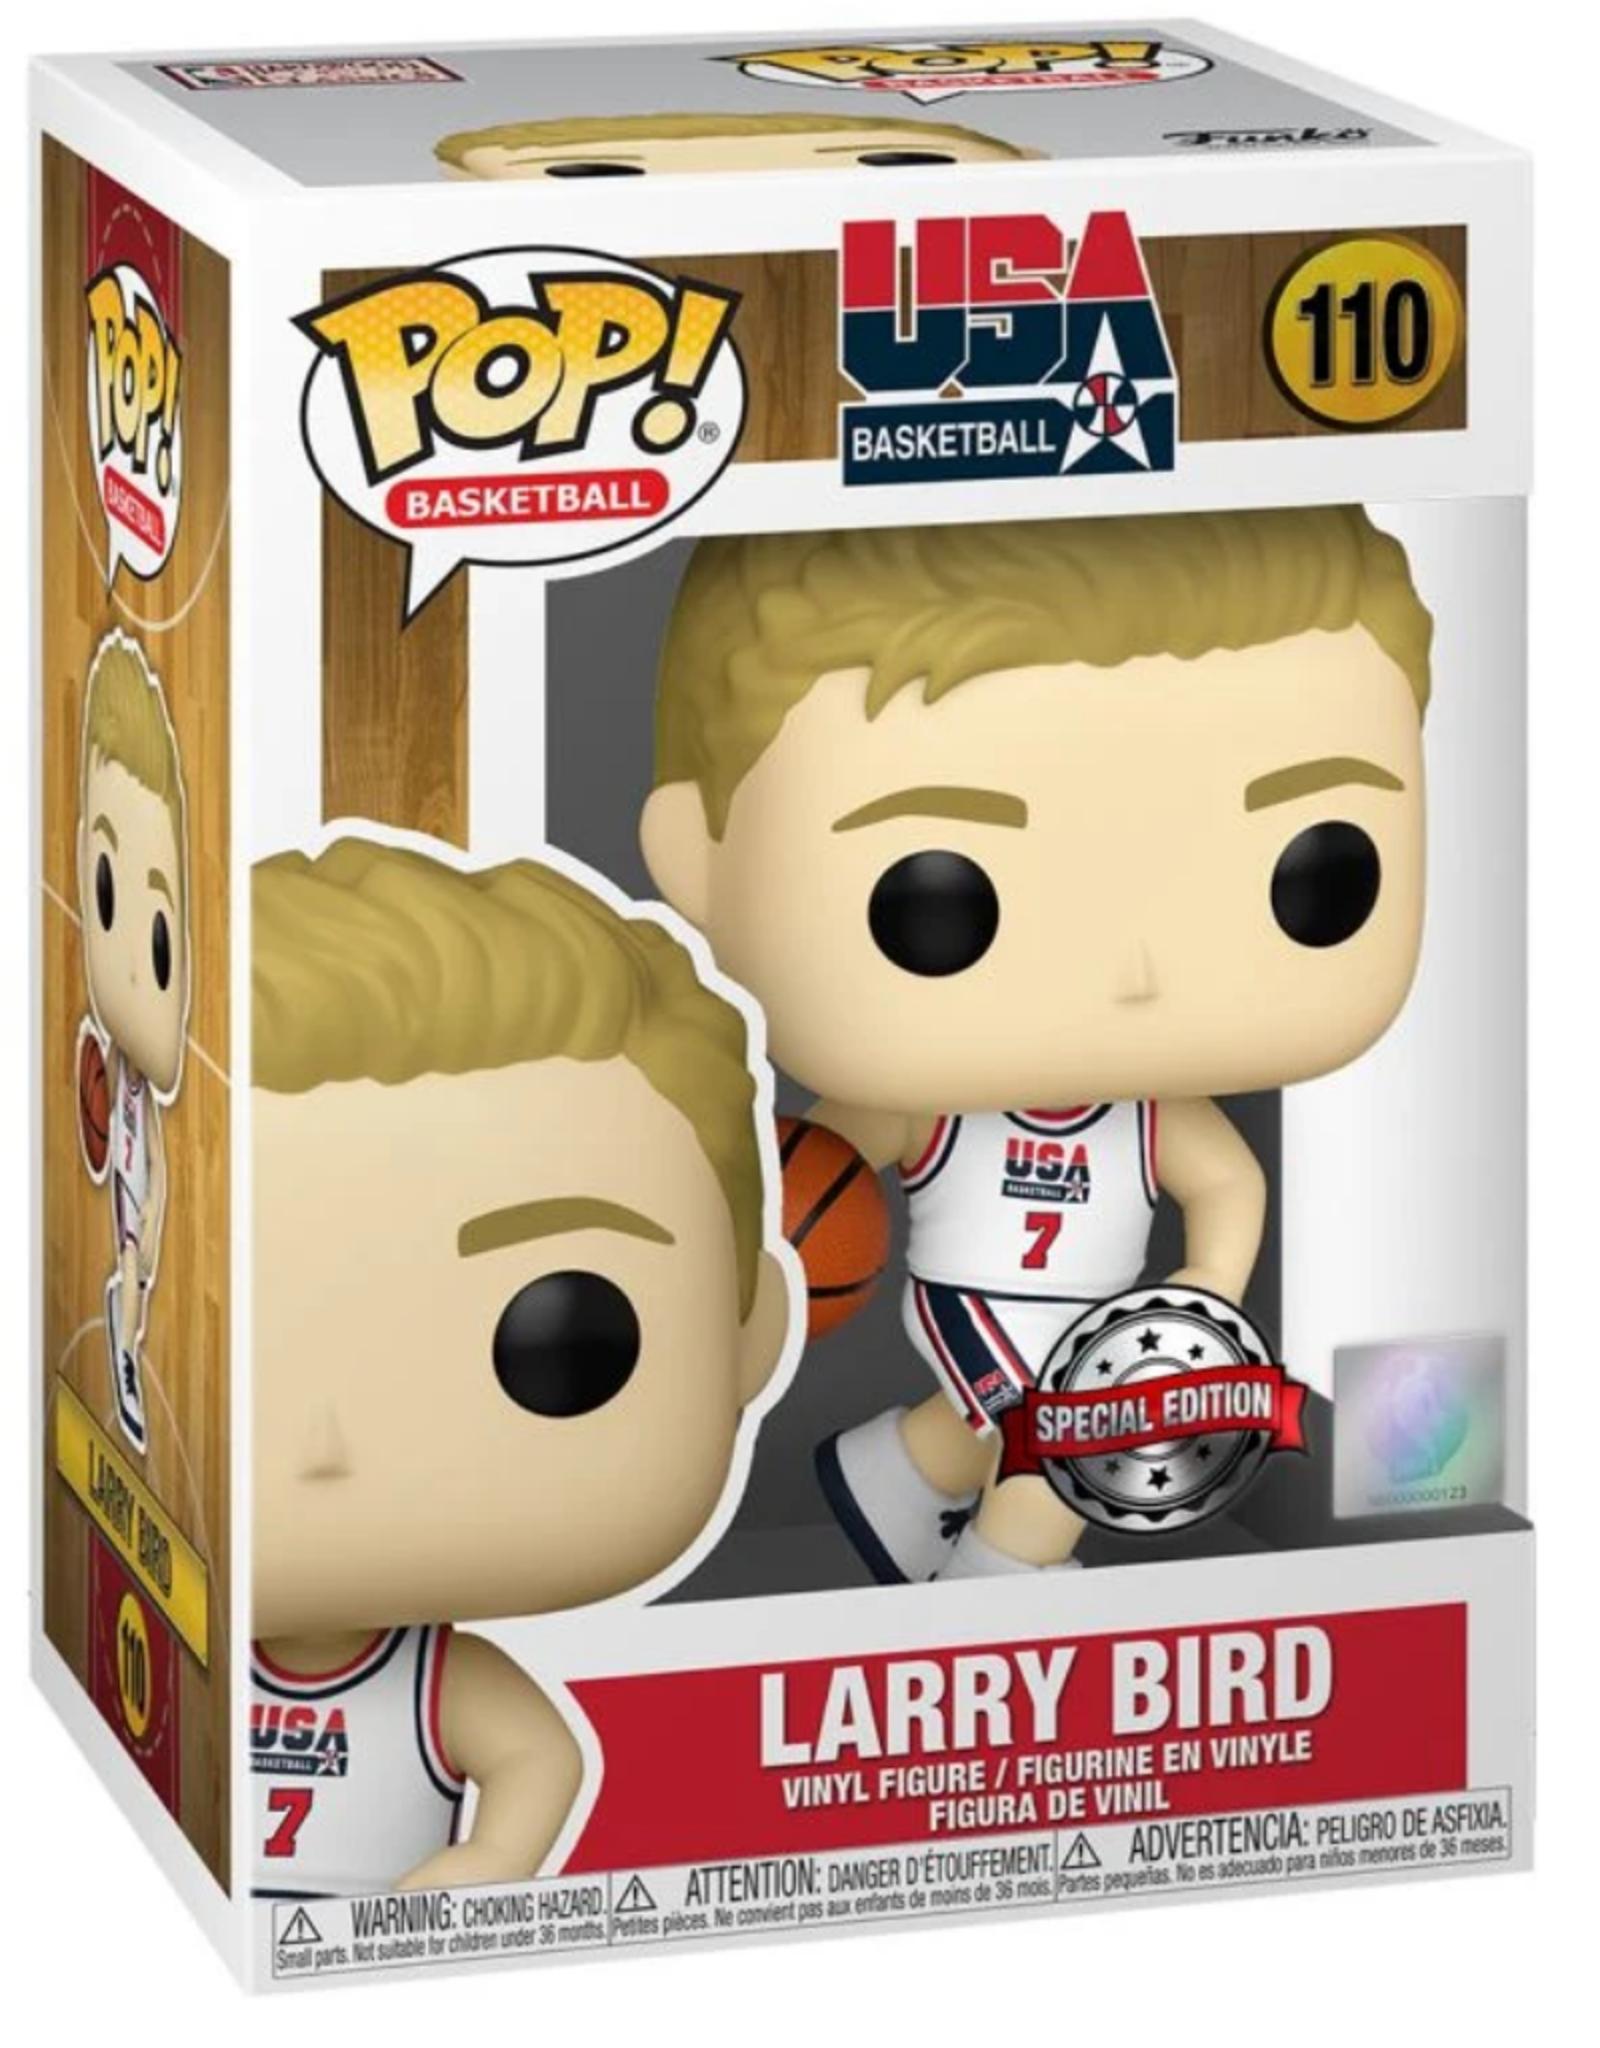 Funko POP! Figure USA Larry Bird #7 White